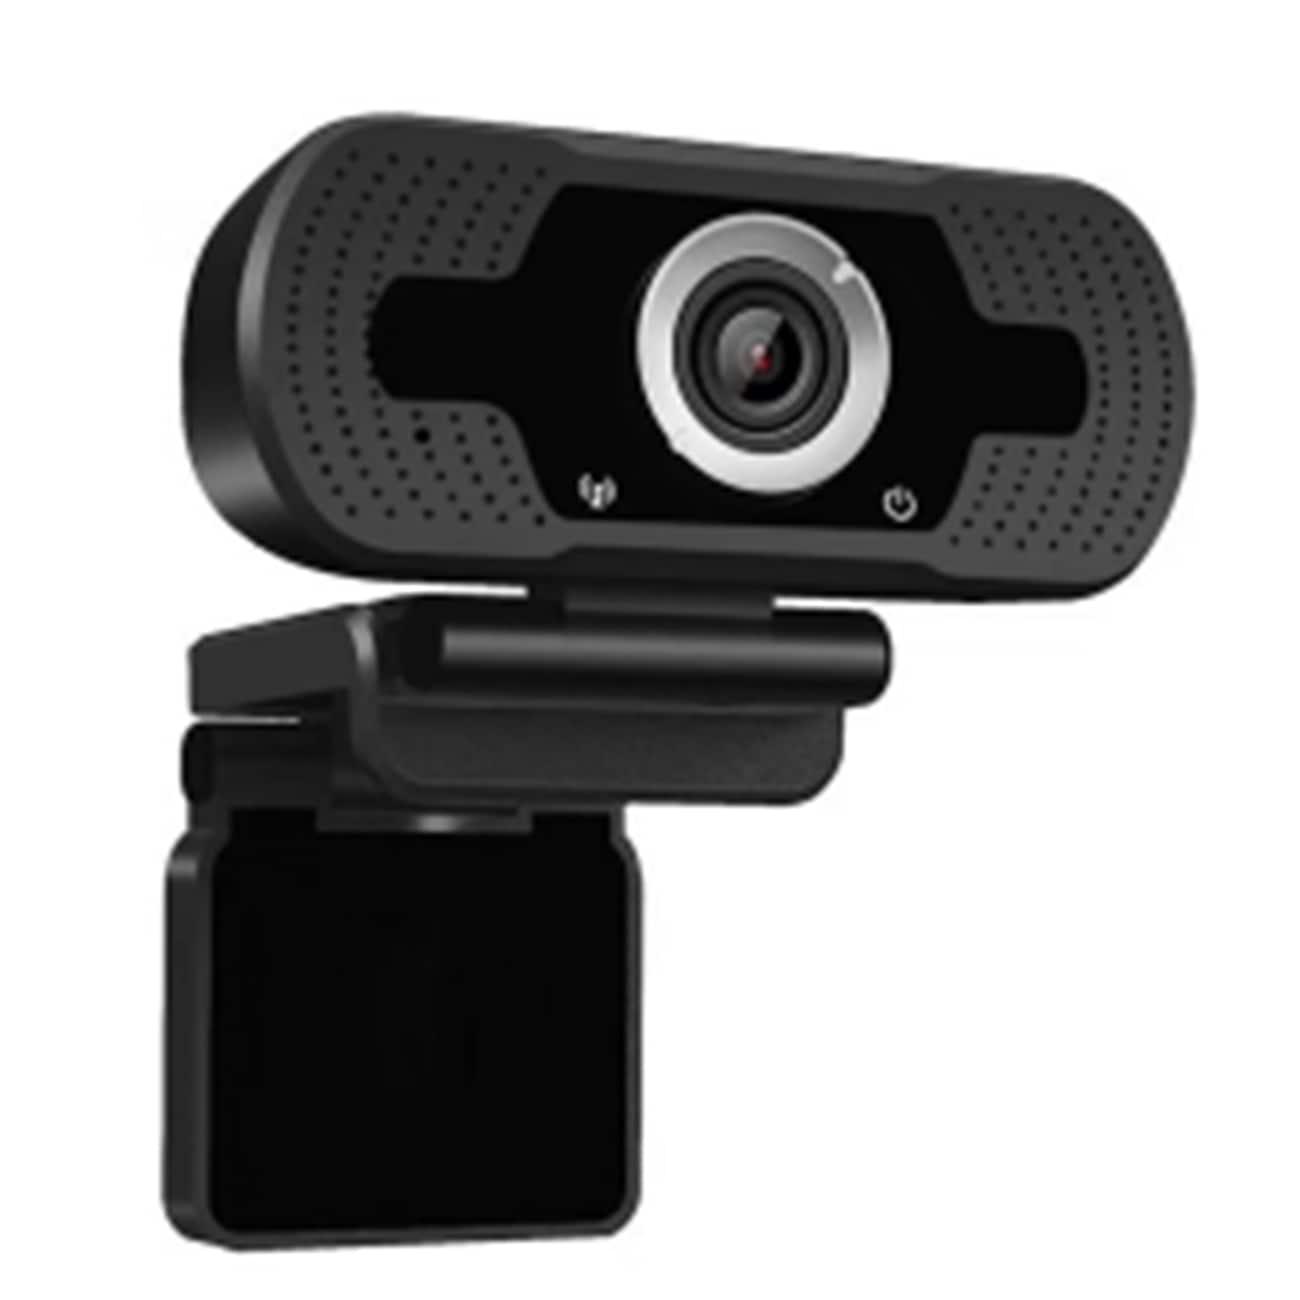 Webcam for Streaming Microphone Camera USB FHD SP-WCAM01 - 7